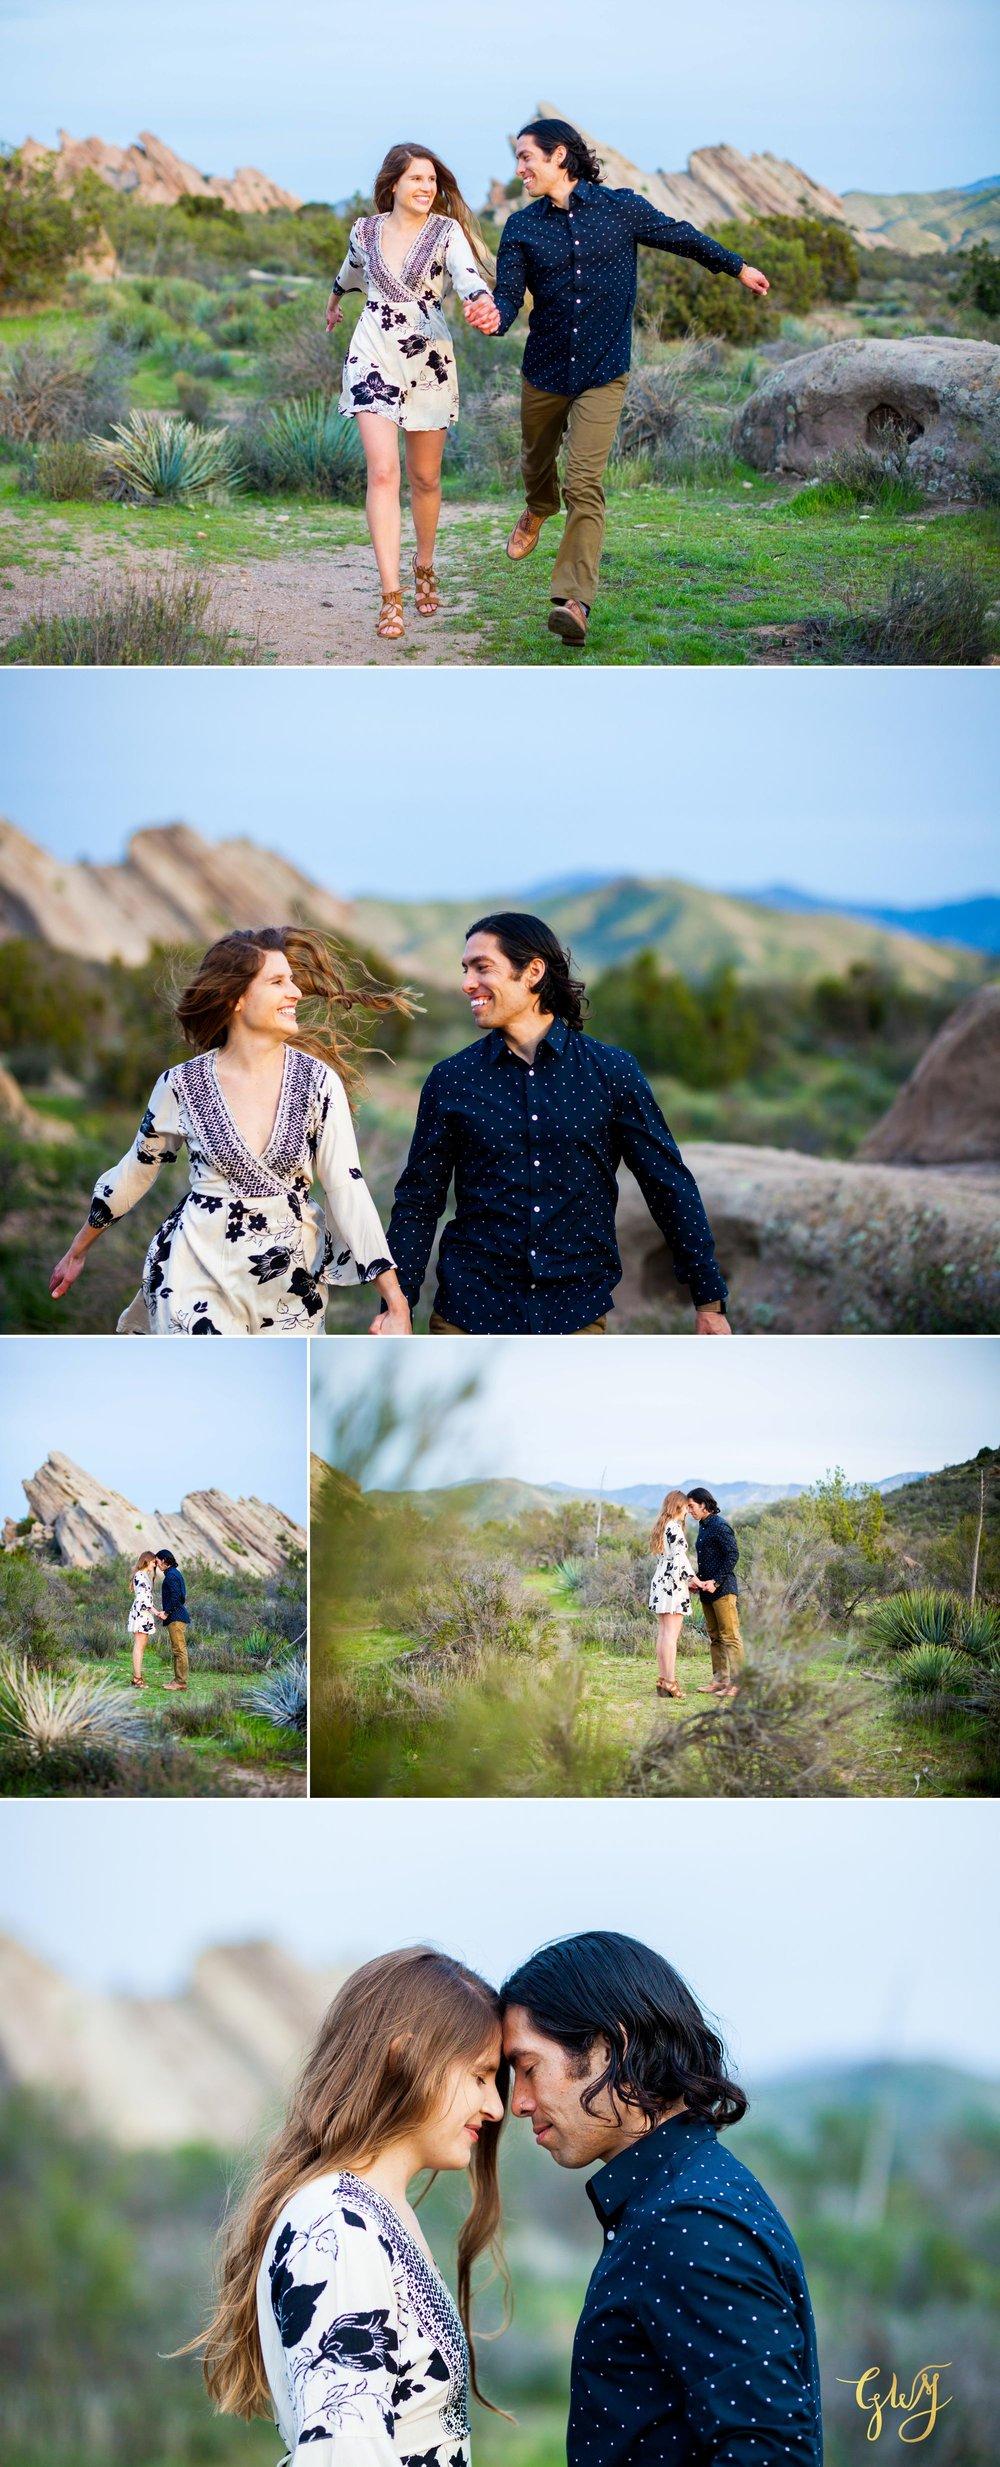 Jose + Sarah Vasquez Rocks Hike at Sunset Adventurous Engagement by Glass Woods Media 16.jpg